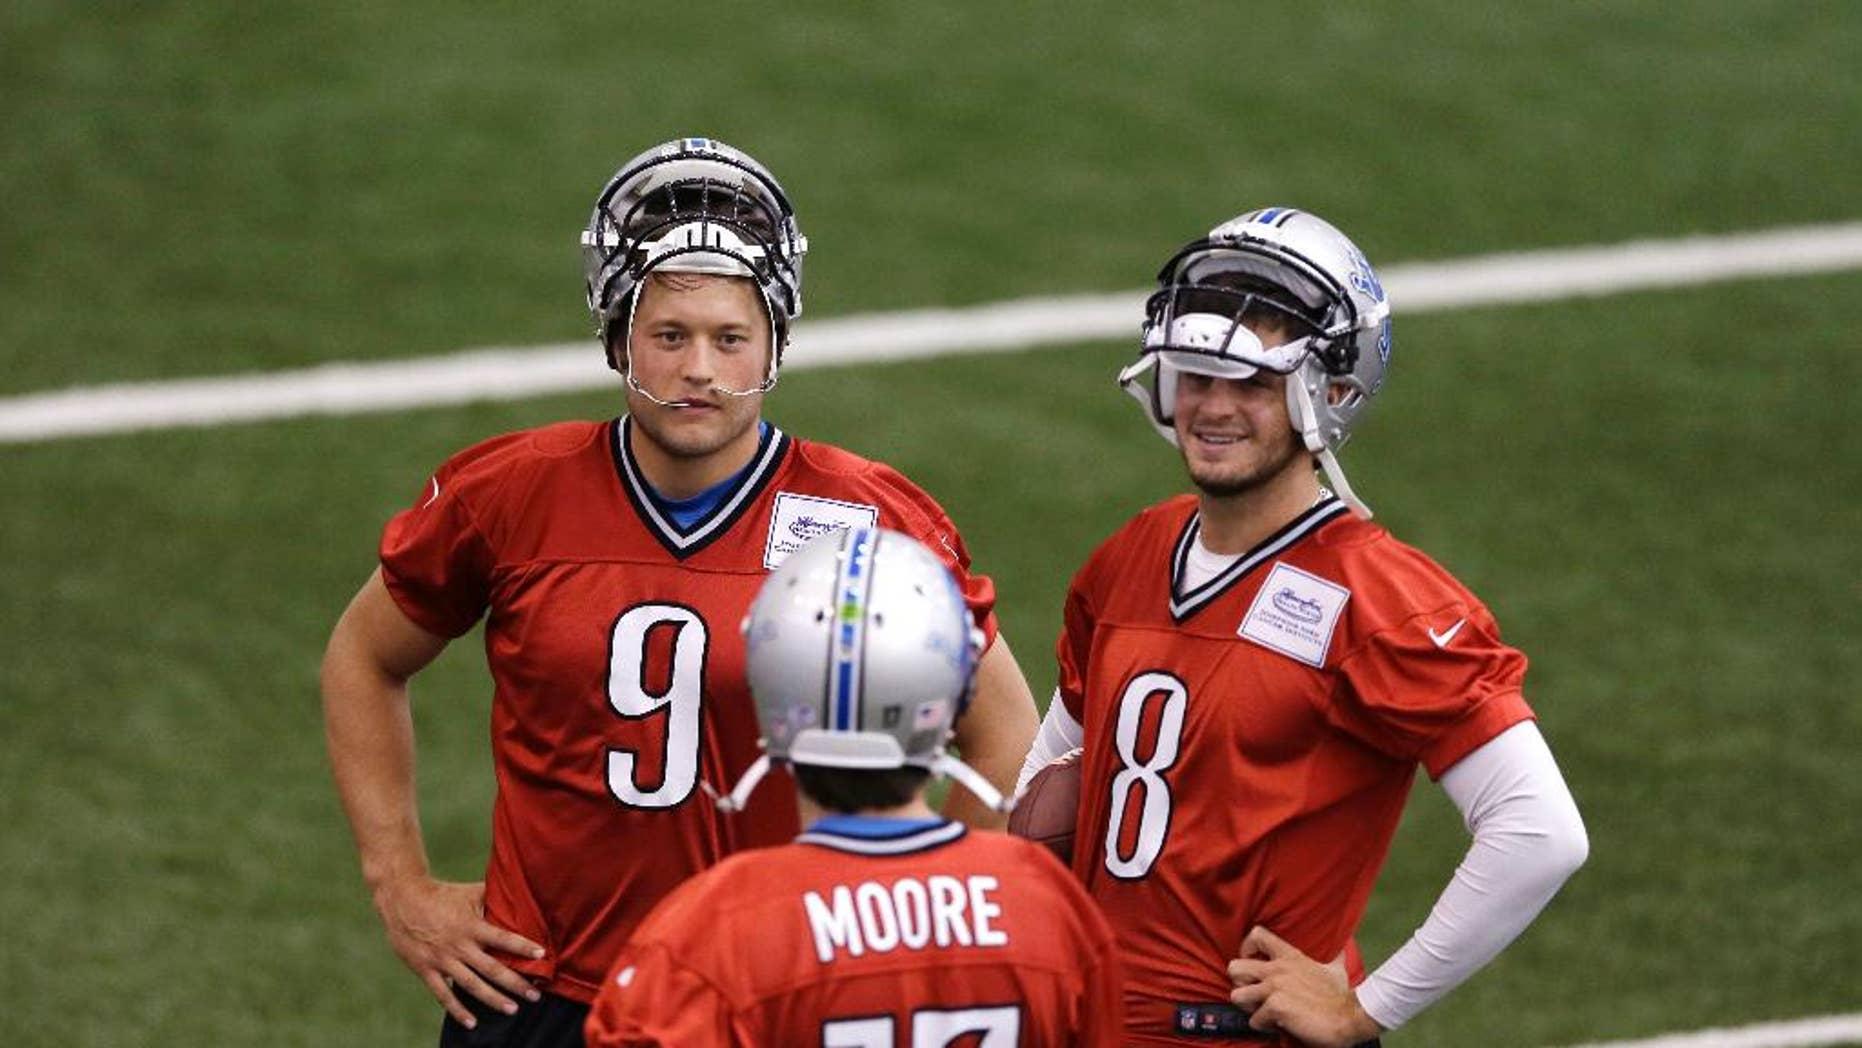 Detroit Lions quarterbacks Matthew Stafford (9) and Dan Orlovsky (8) talk with quarterback Kellen Moore (17) during an NFL football training camp, Monday, Aug. 11, 2014, in Allen Park, Mich. (AP Photo/Carlos Osorio)